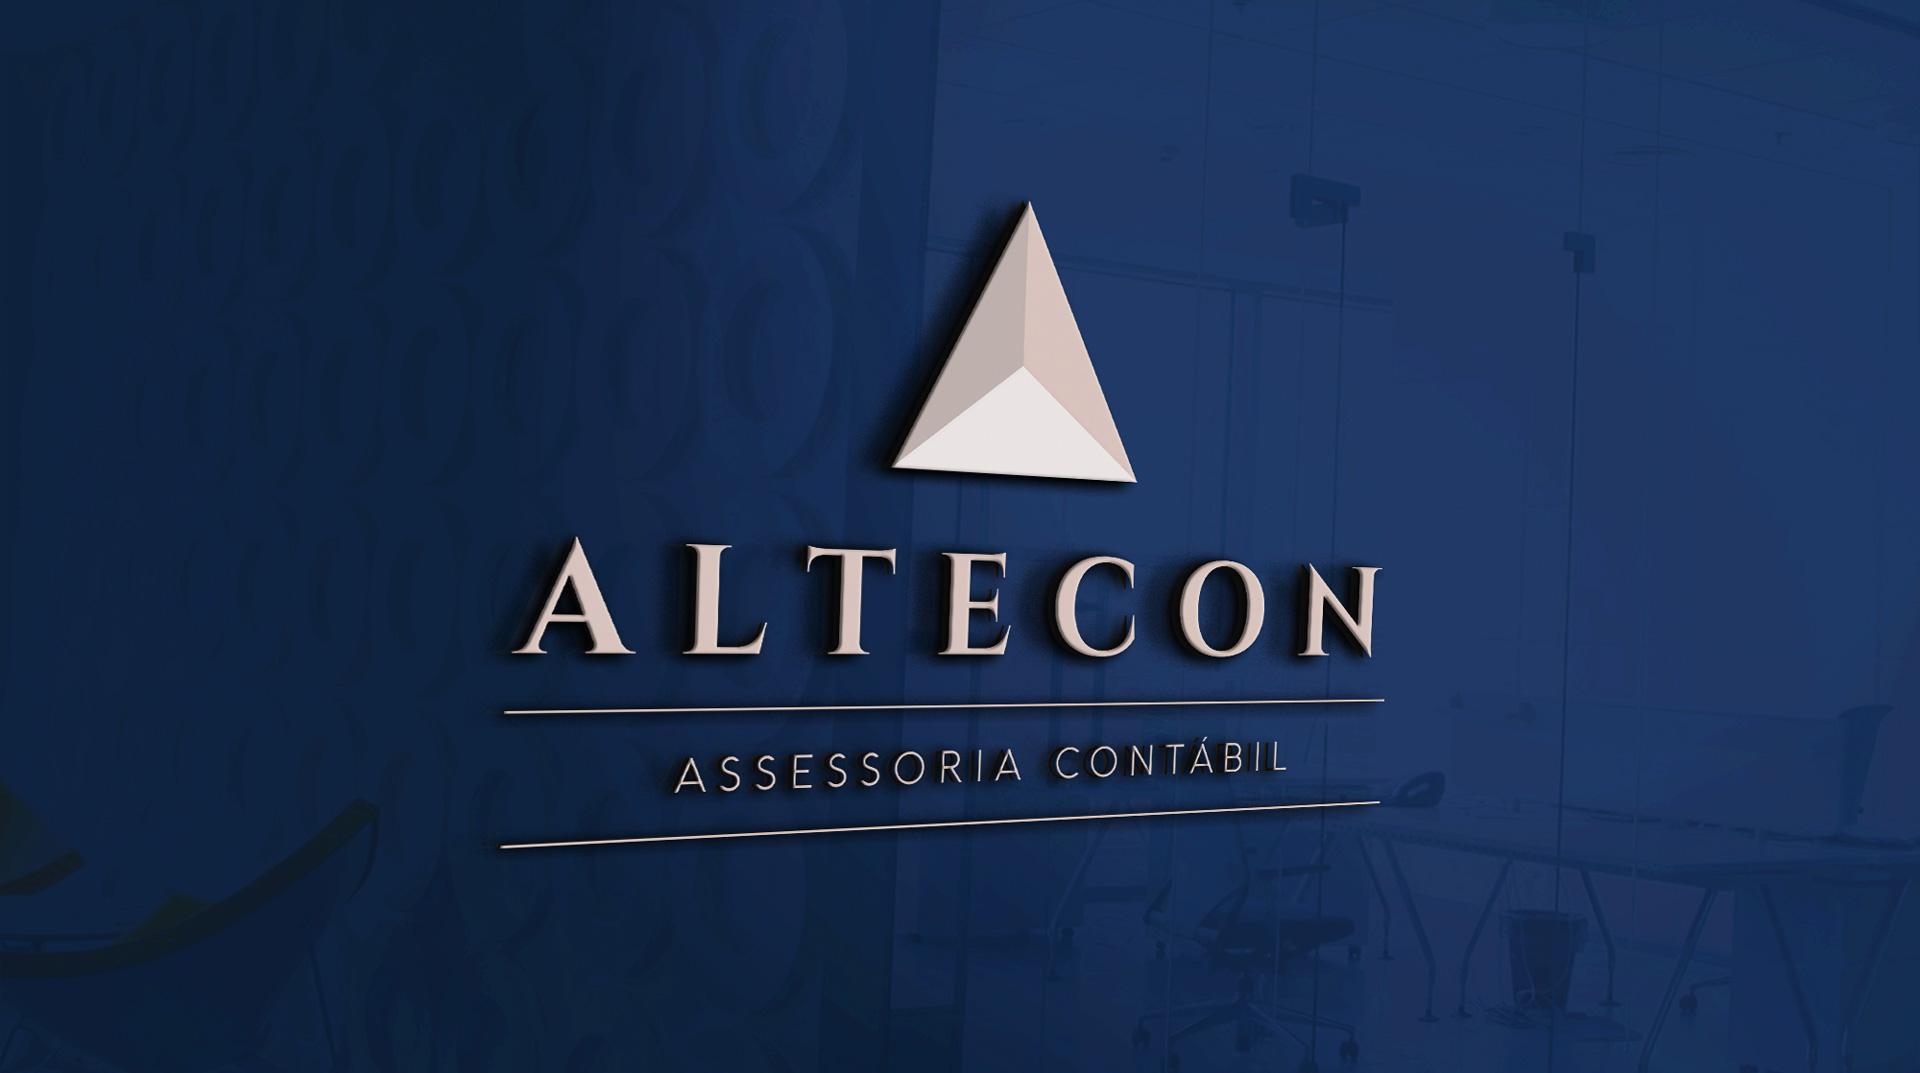 Altecon